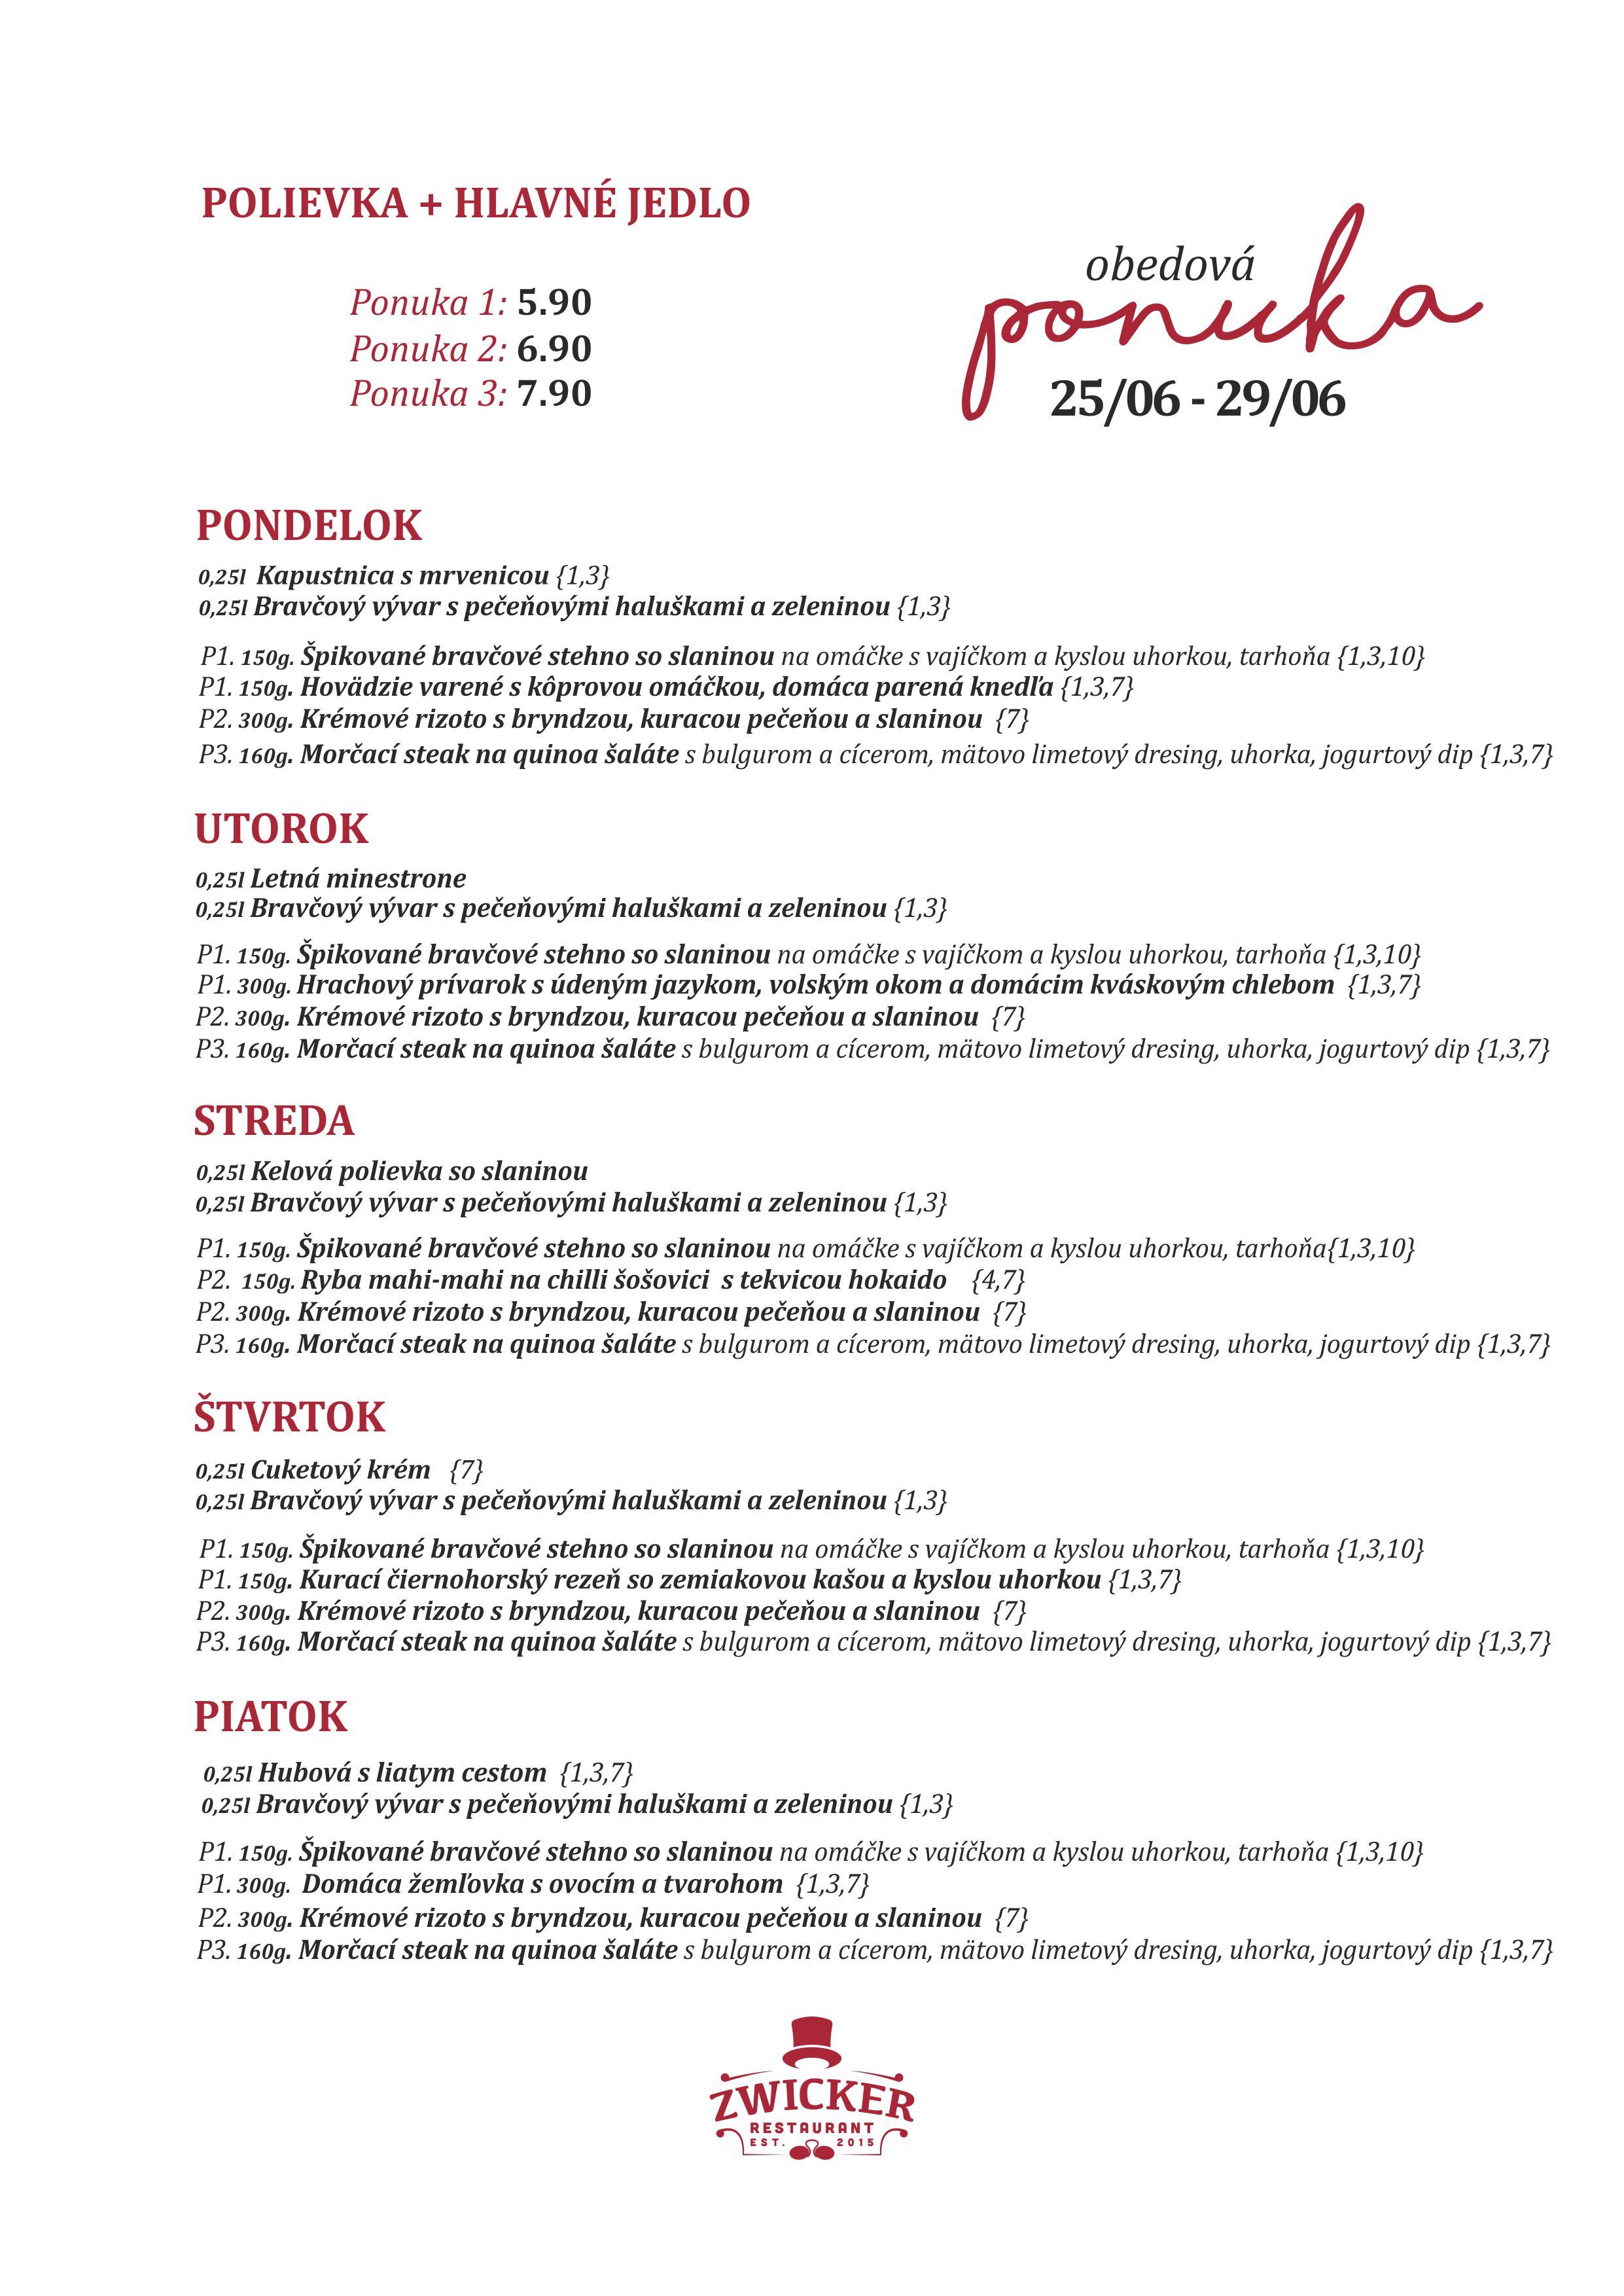 OBEDOVE MENU ZWICKER 25_06_18